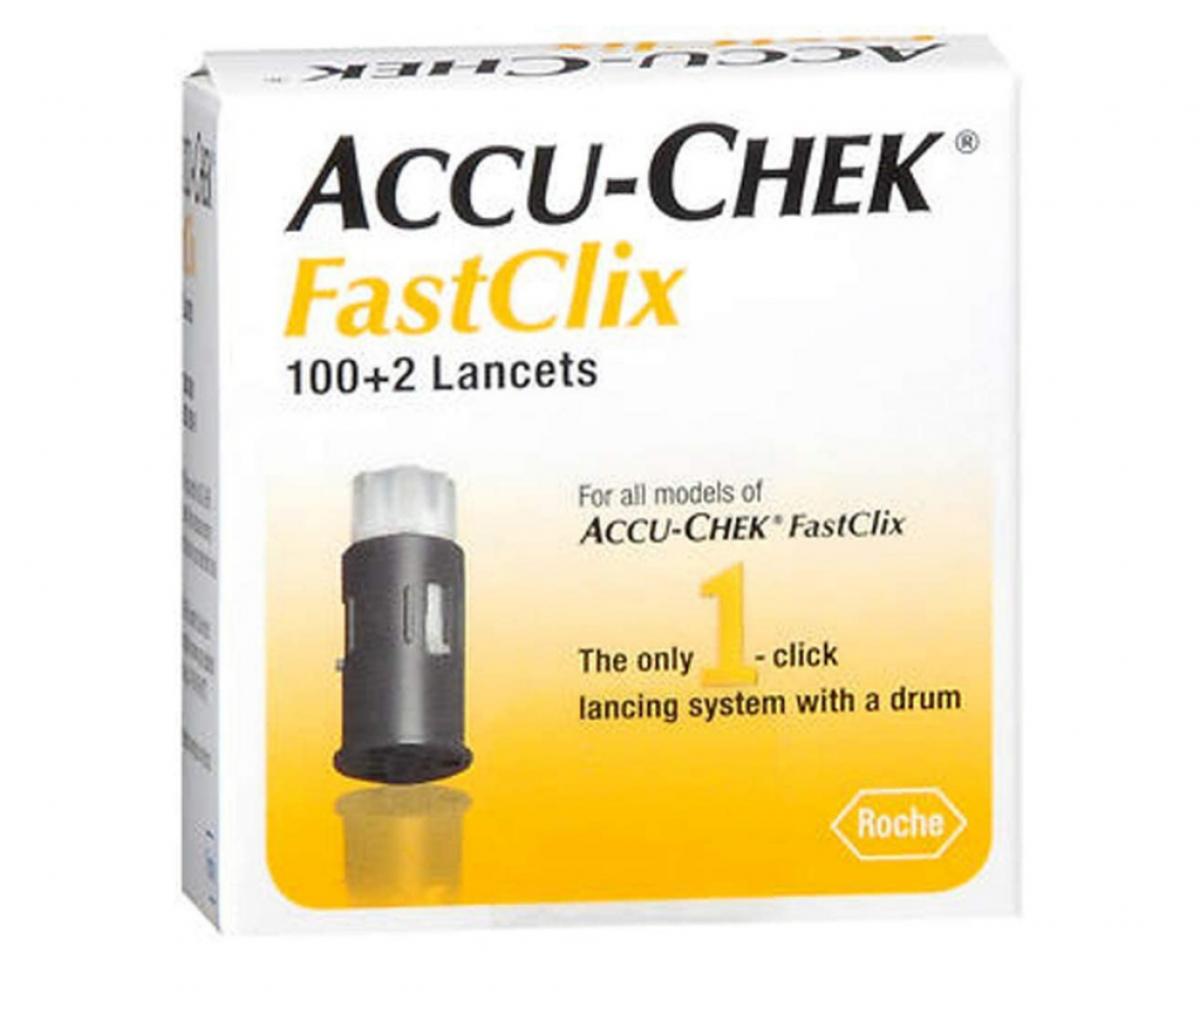 Accu Check Lancets